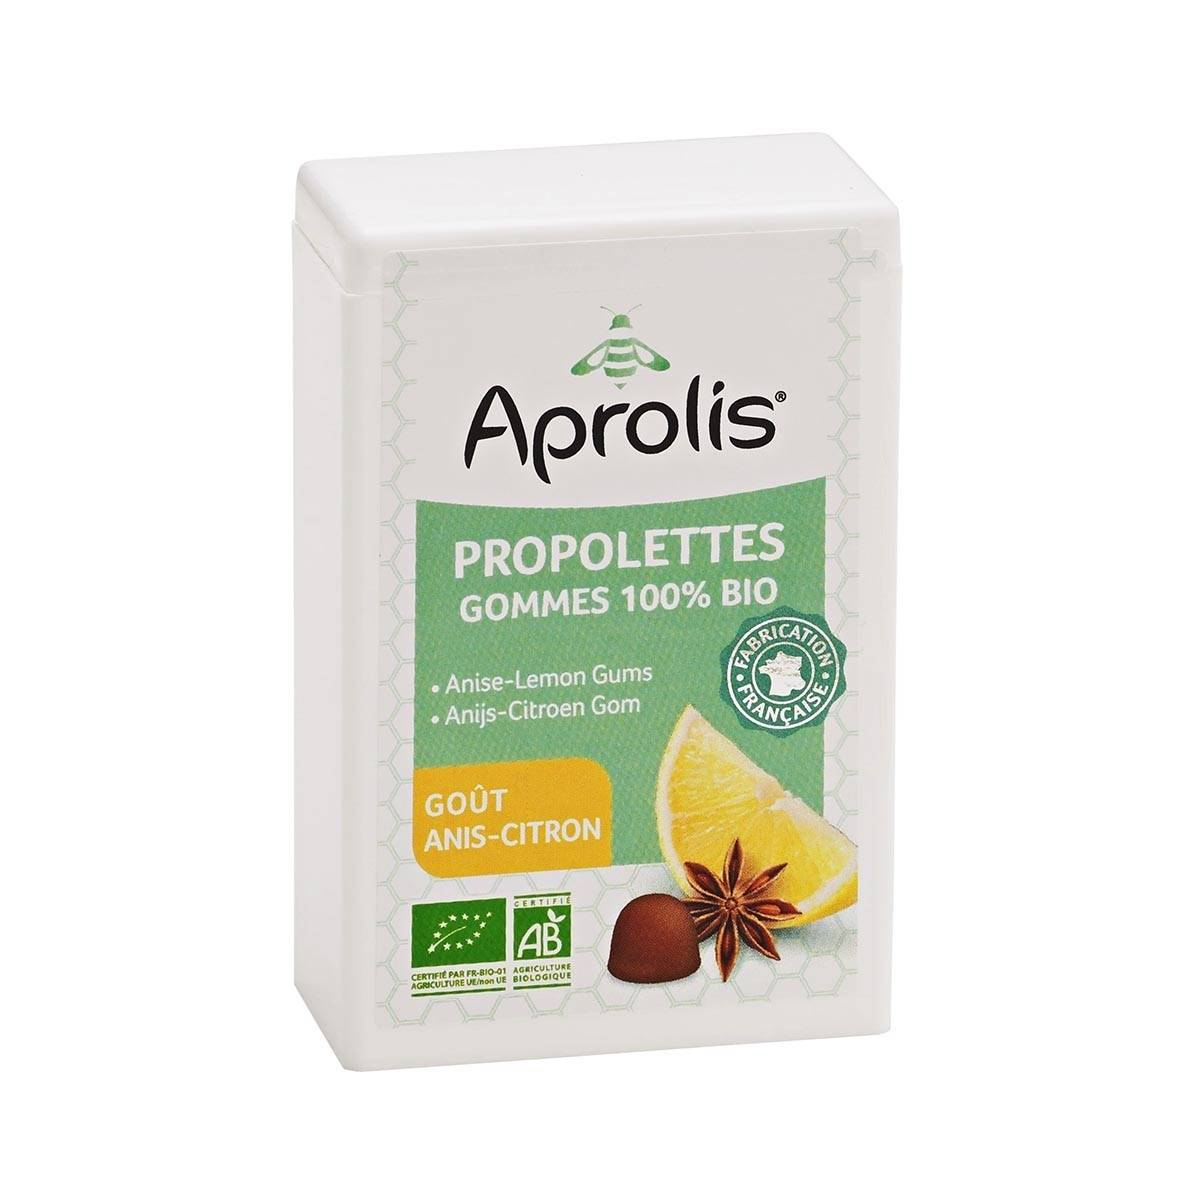 APROLIS Propolettes Anis-Citron 50g Bio - Aprolis